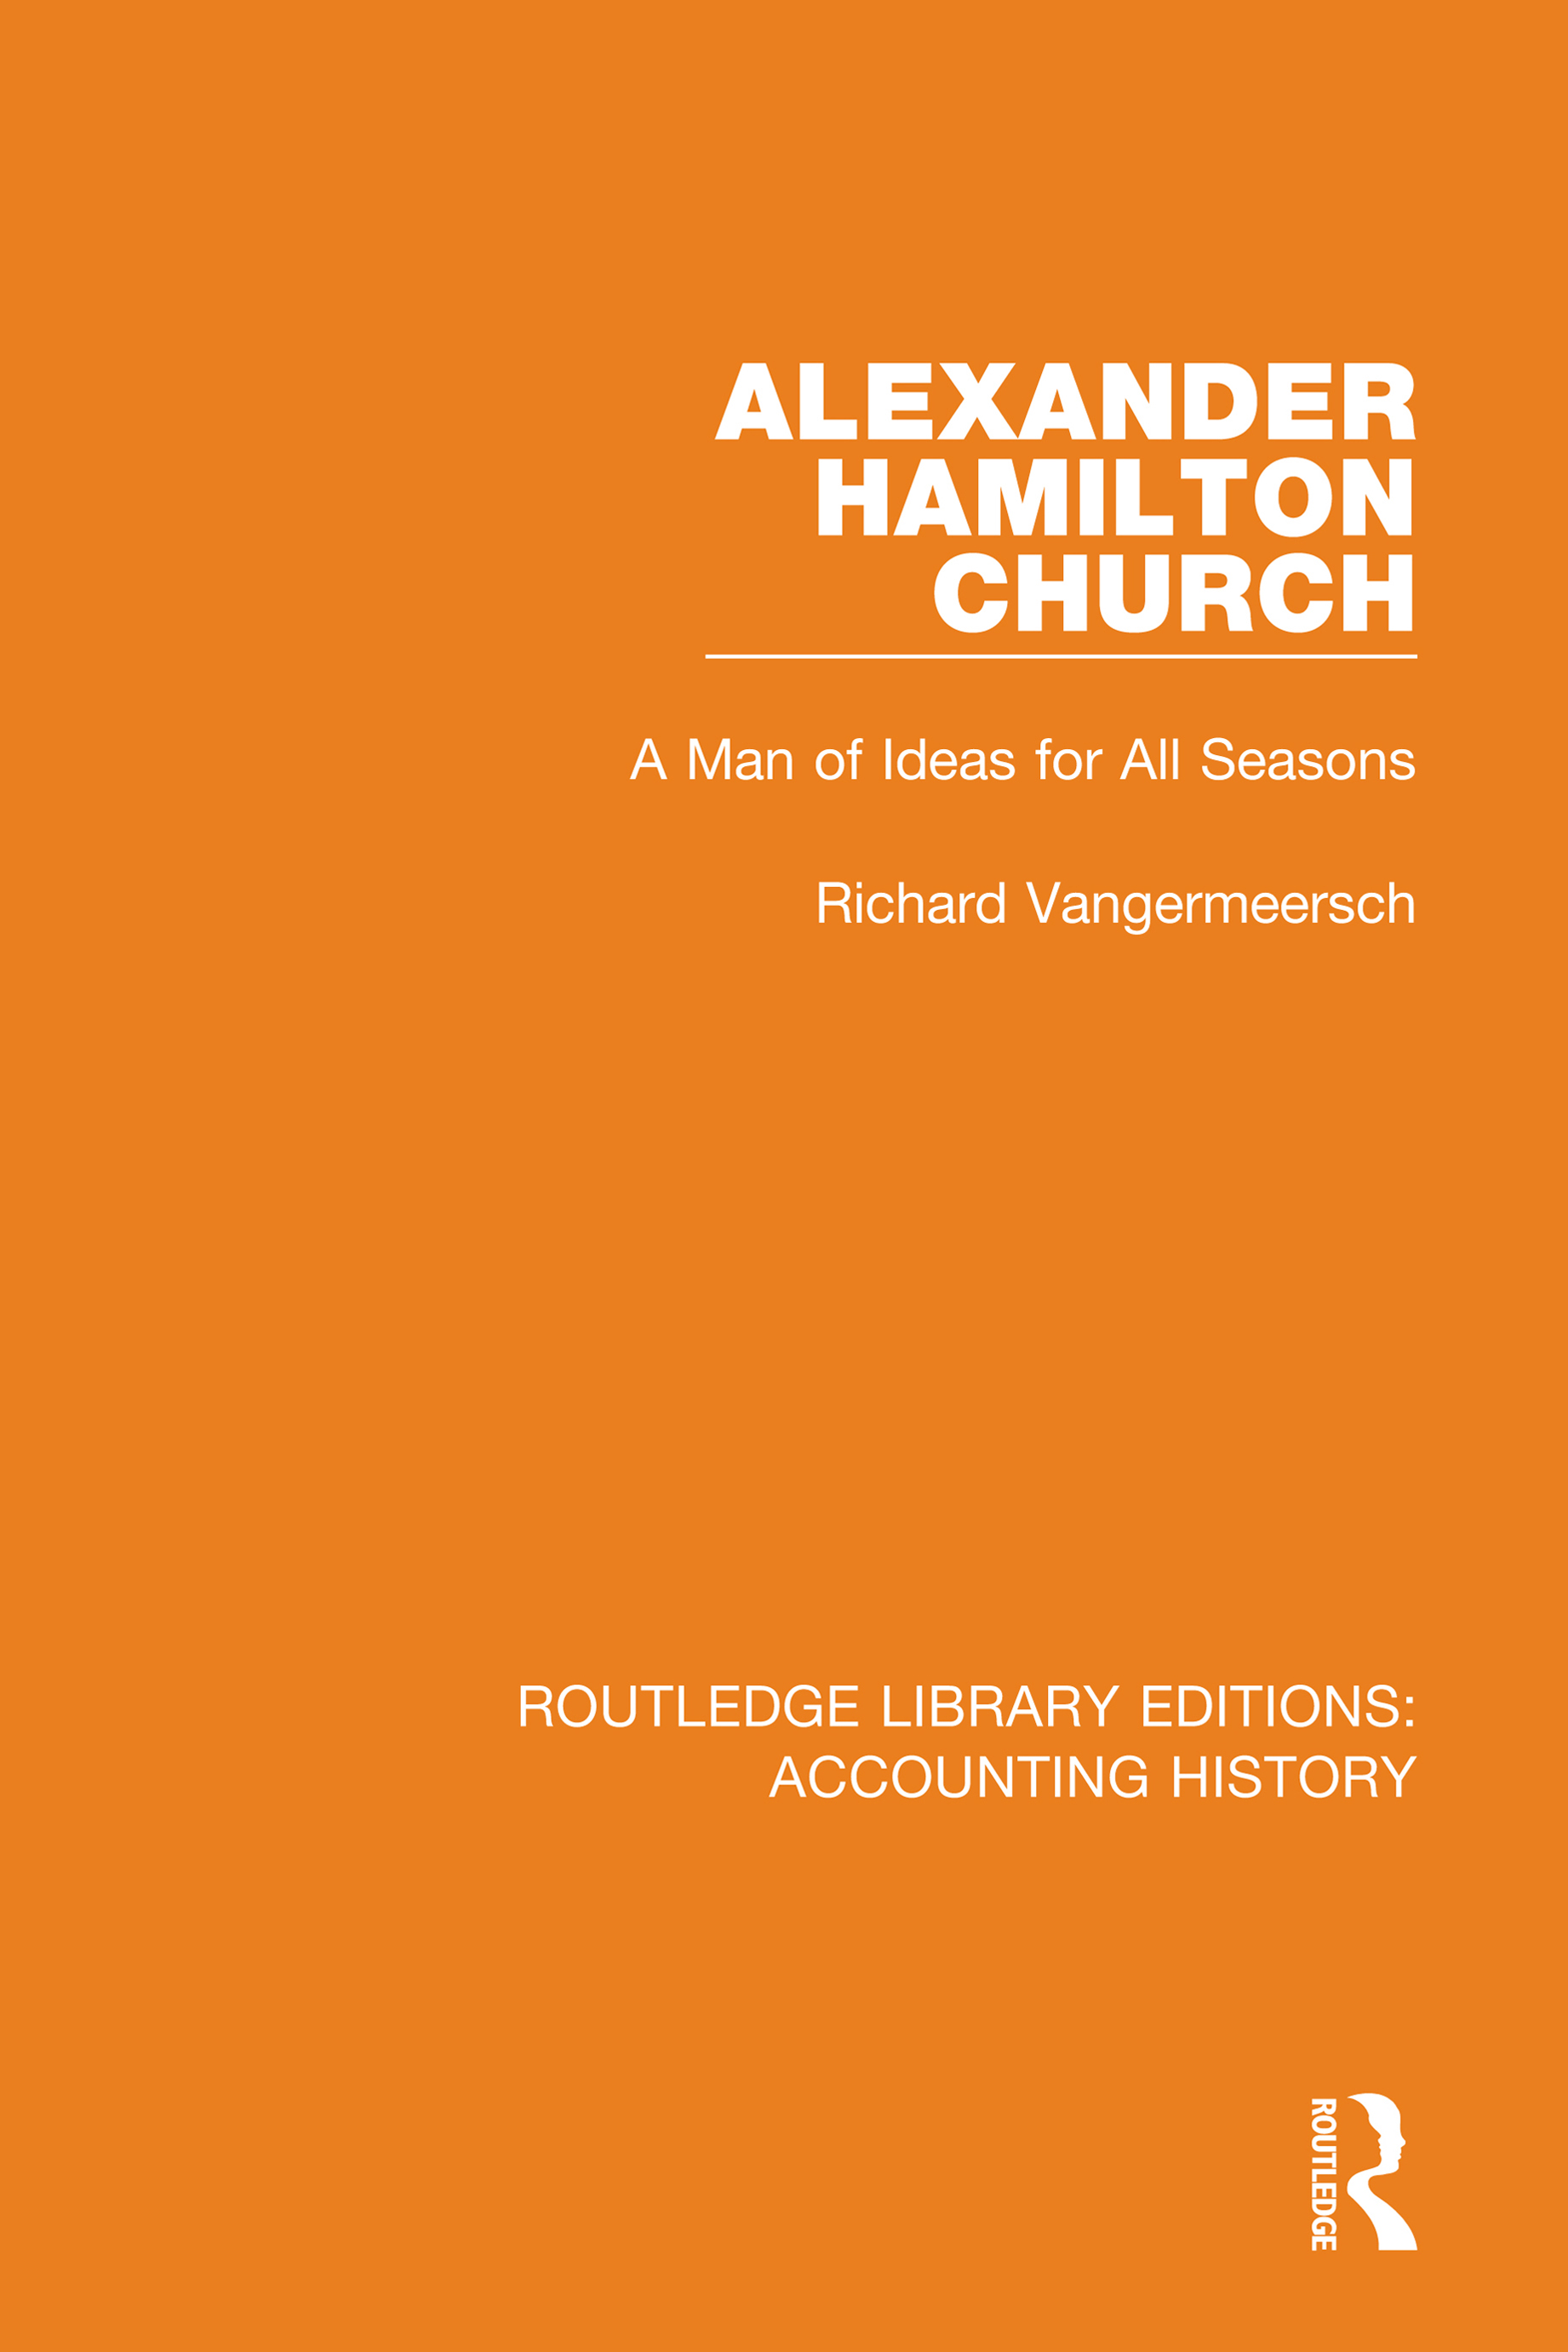 Alexander Hamilton Church